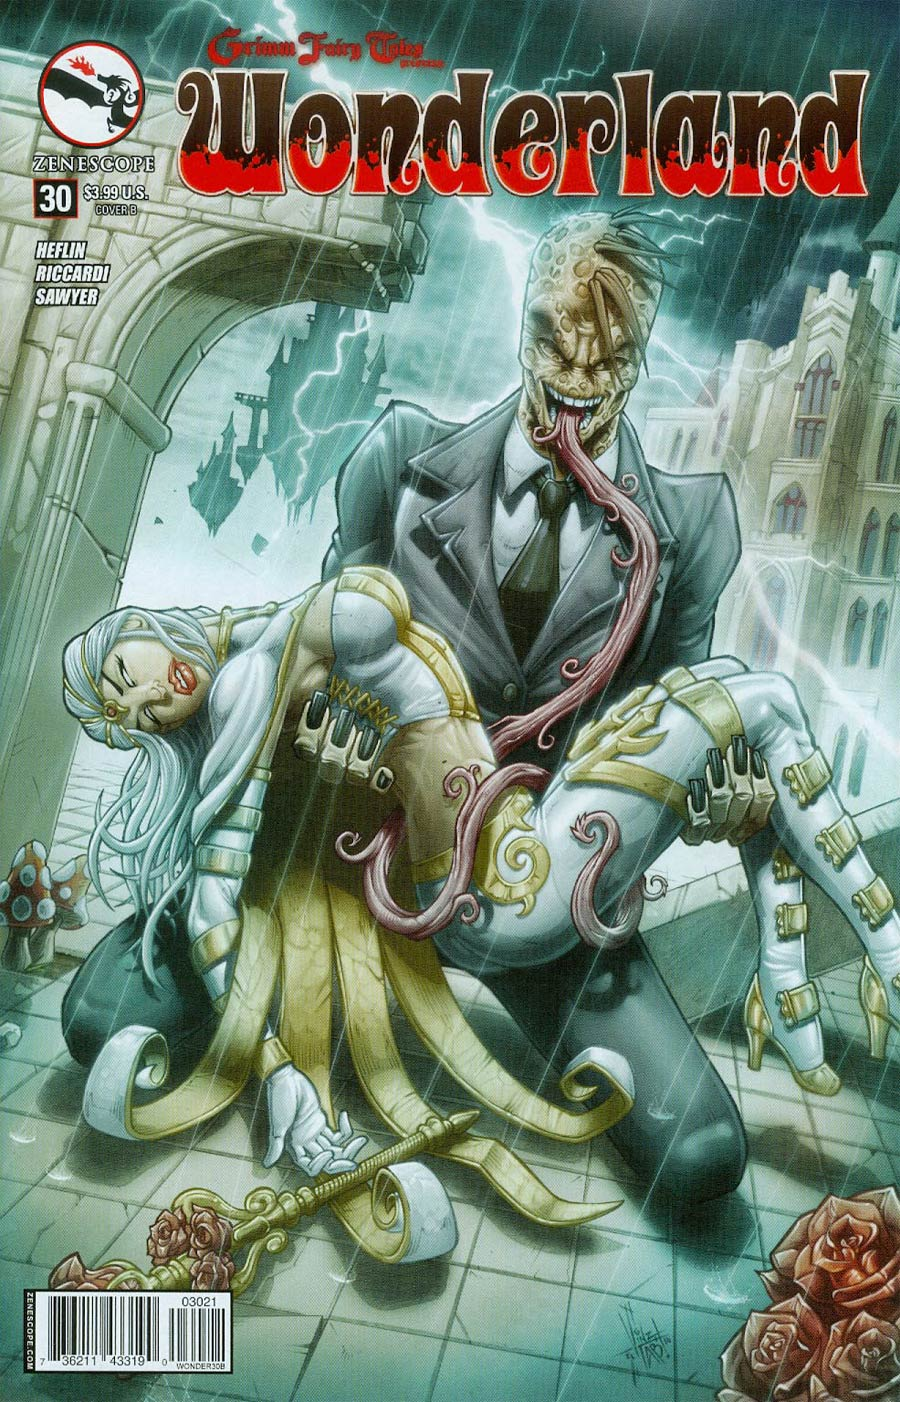 Grimm Fairy Tales Presents Wonderland Vol 2 #30 Cover B Vinz el Tabanas